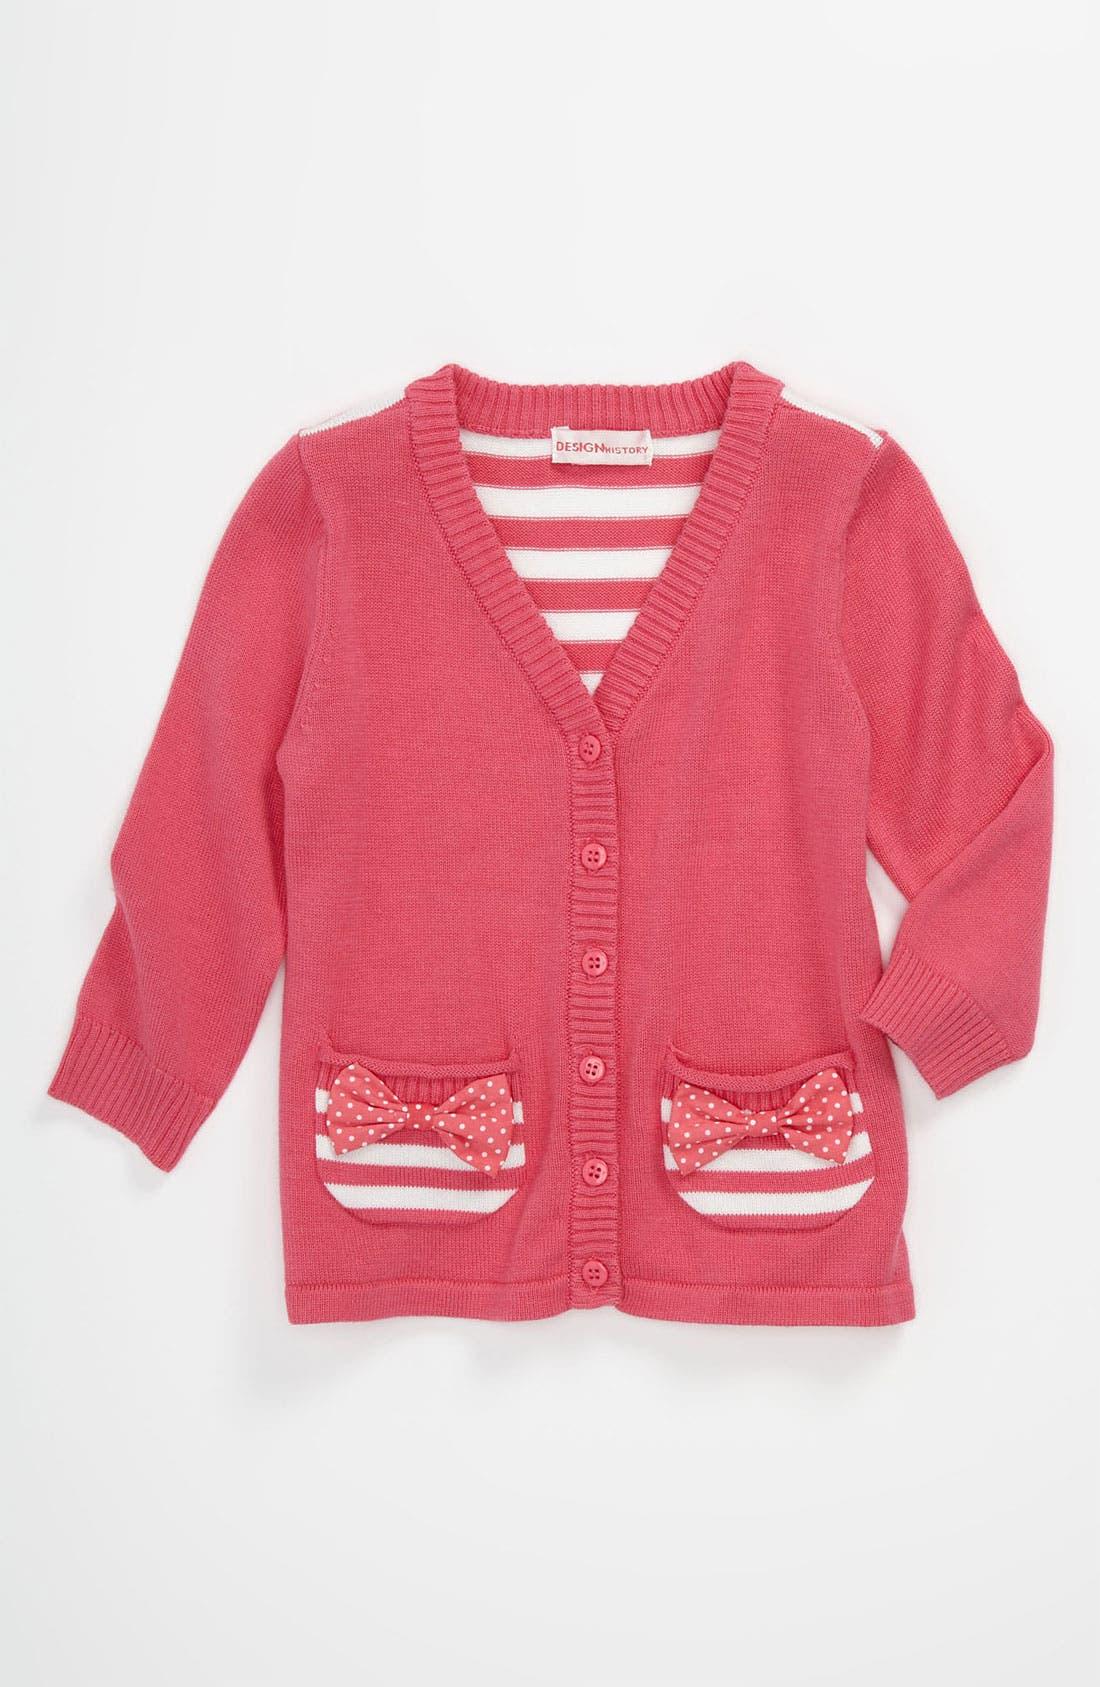 Main Image - Design History Cardigan (Baby)